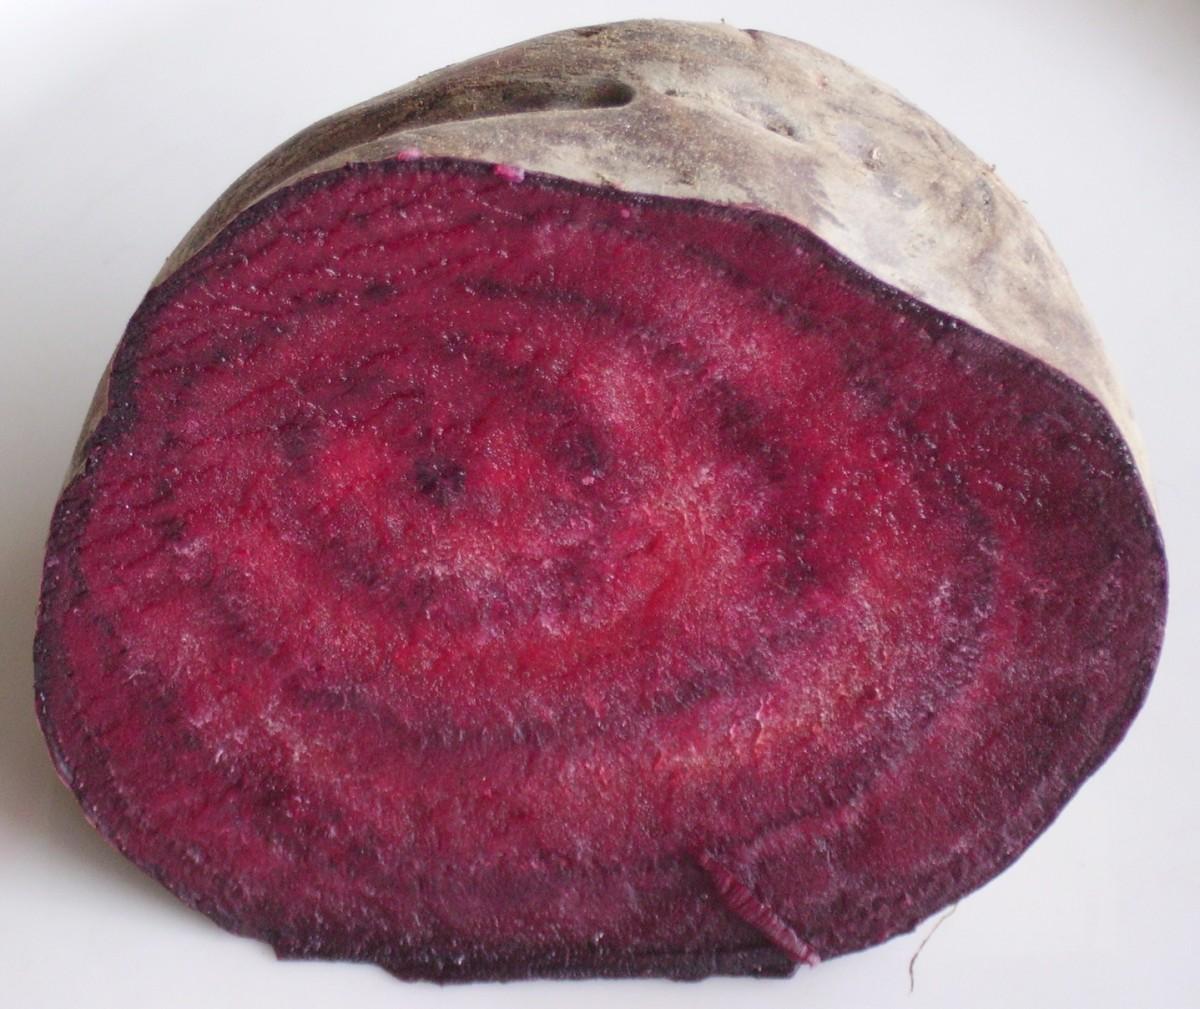 half cut beet